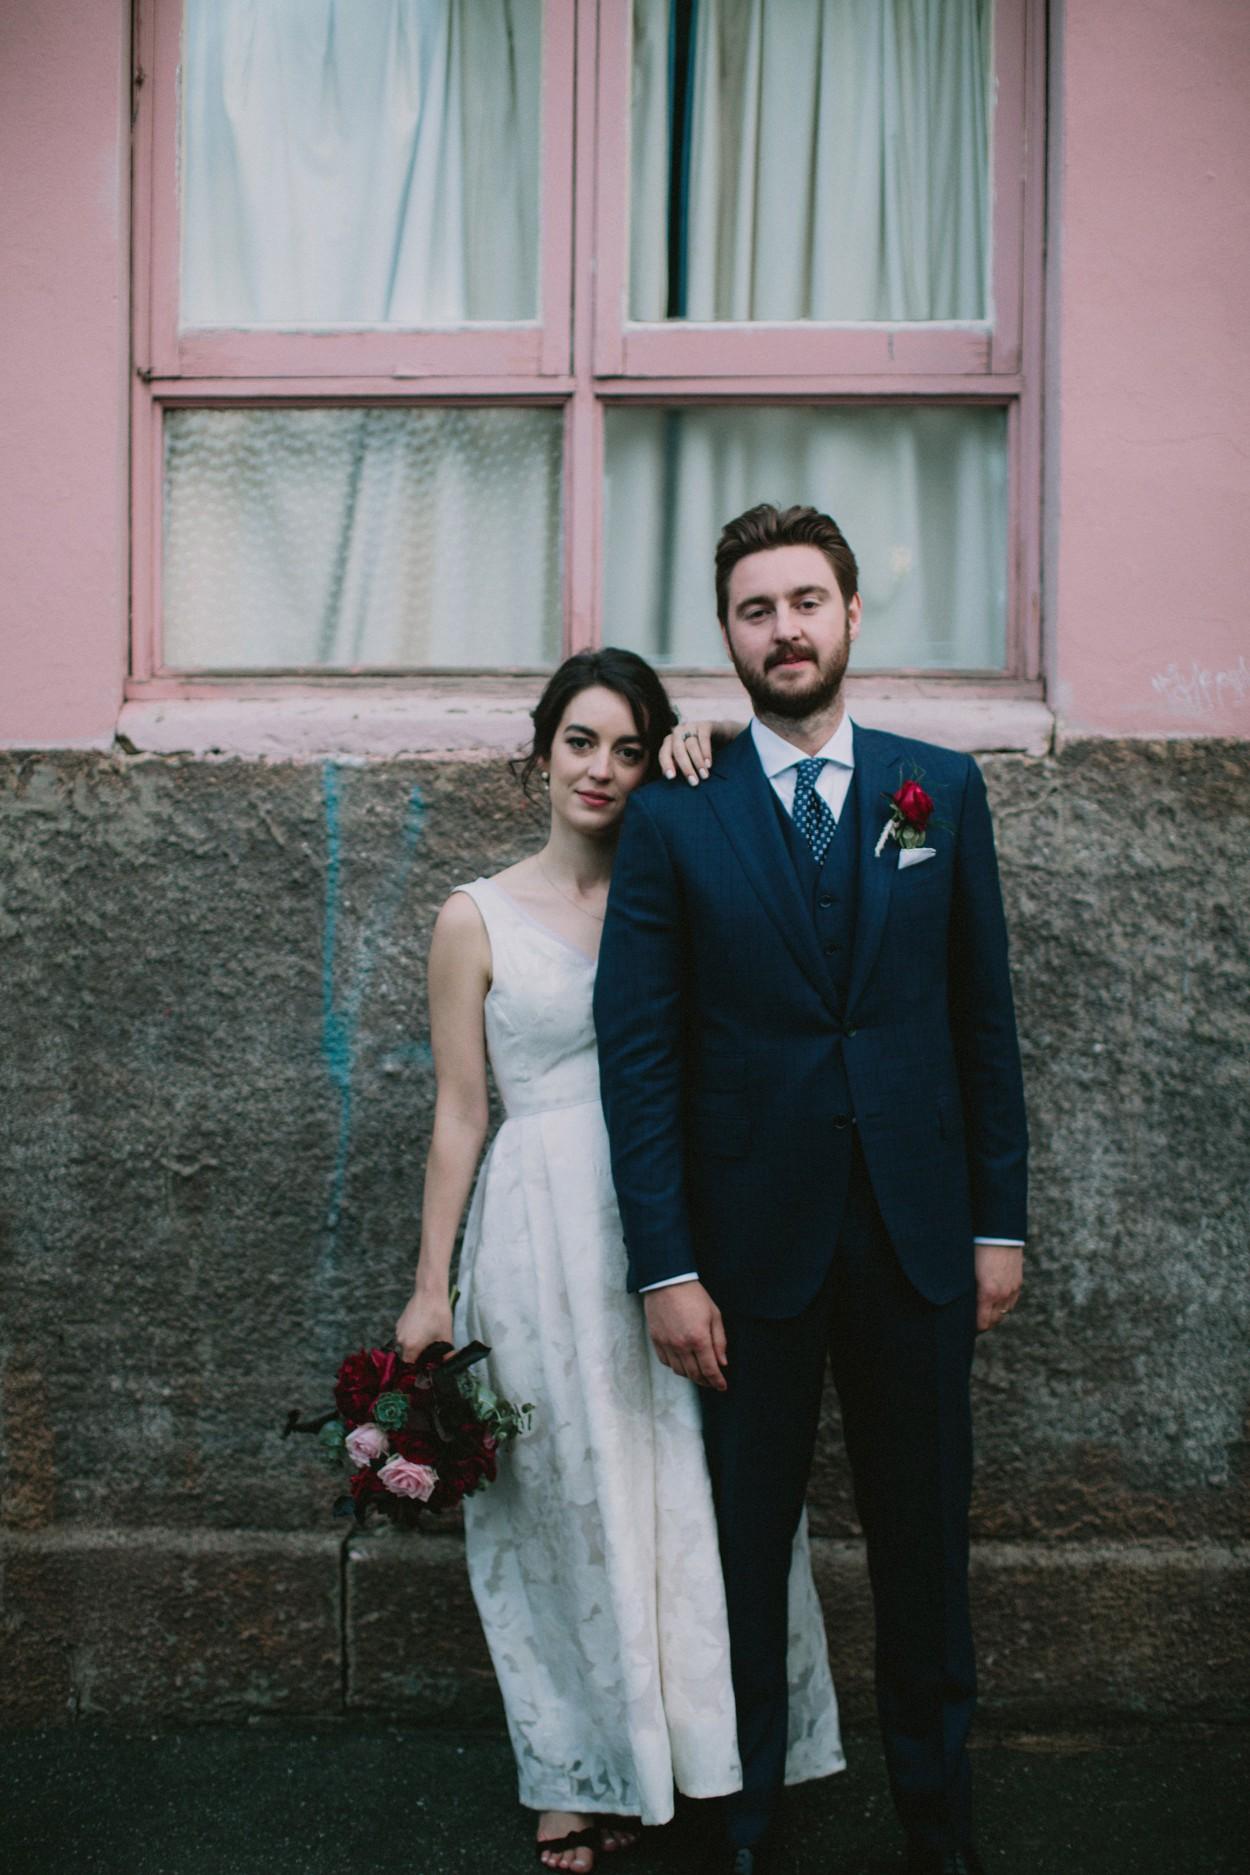 I-Got-You-Babe-Weddings-Fitzroy-Town-Hall-Lauren-Hugo165.jpg